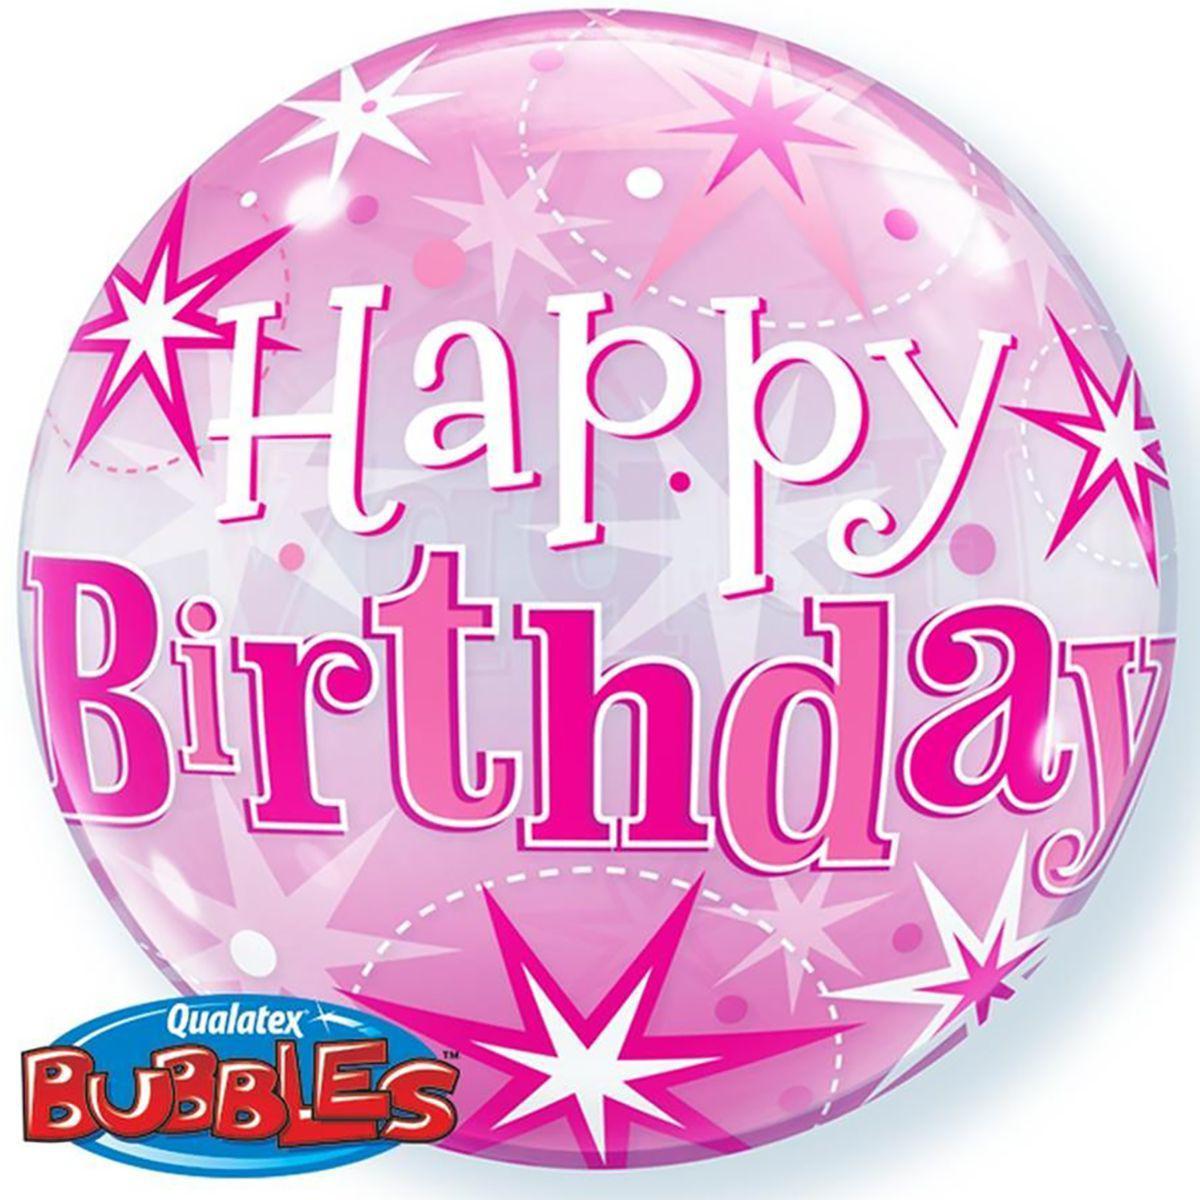 "Шар Bubble Бабл 22""/56 см ХБ Розовый фейерверк Happy birthday (Qualatex)"